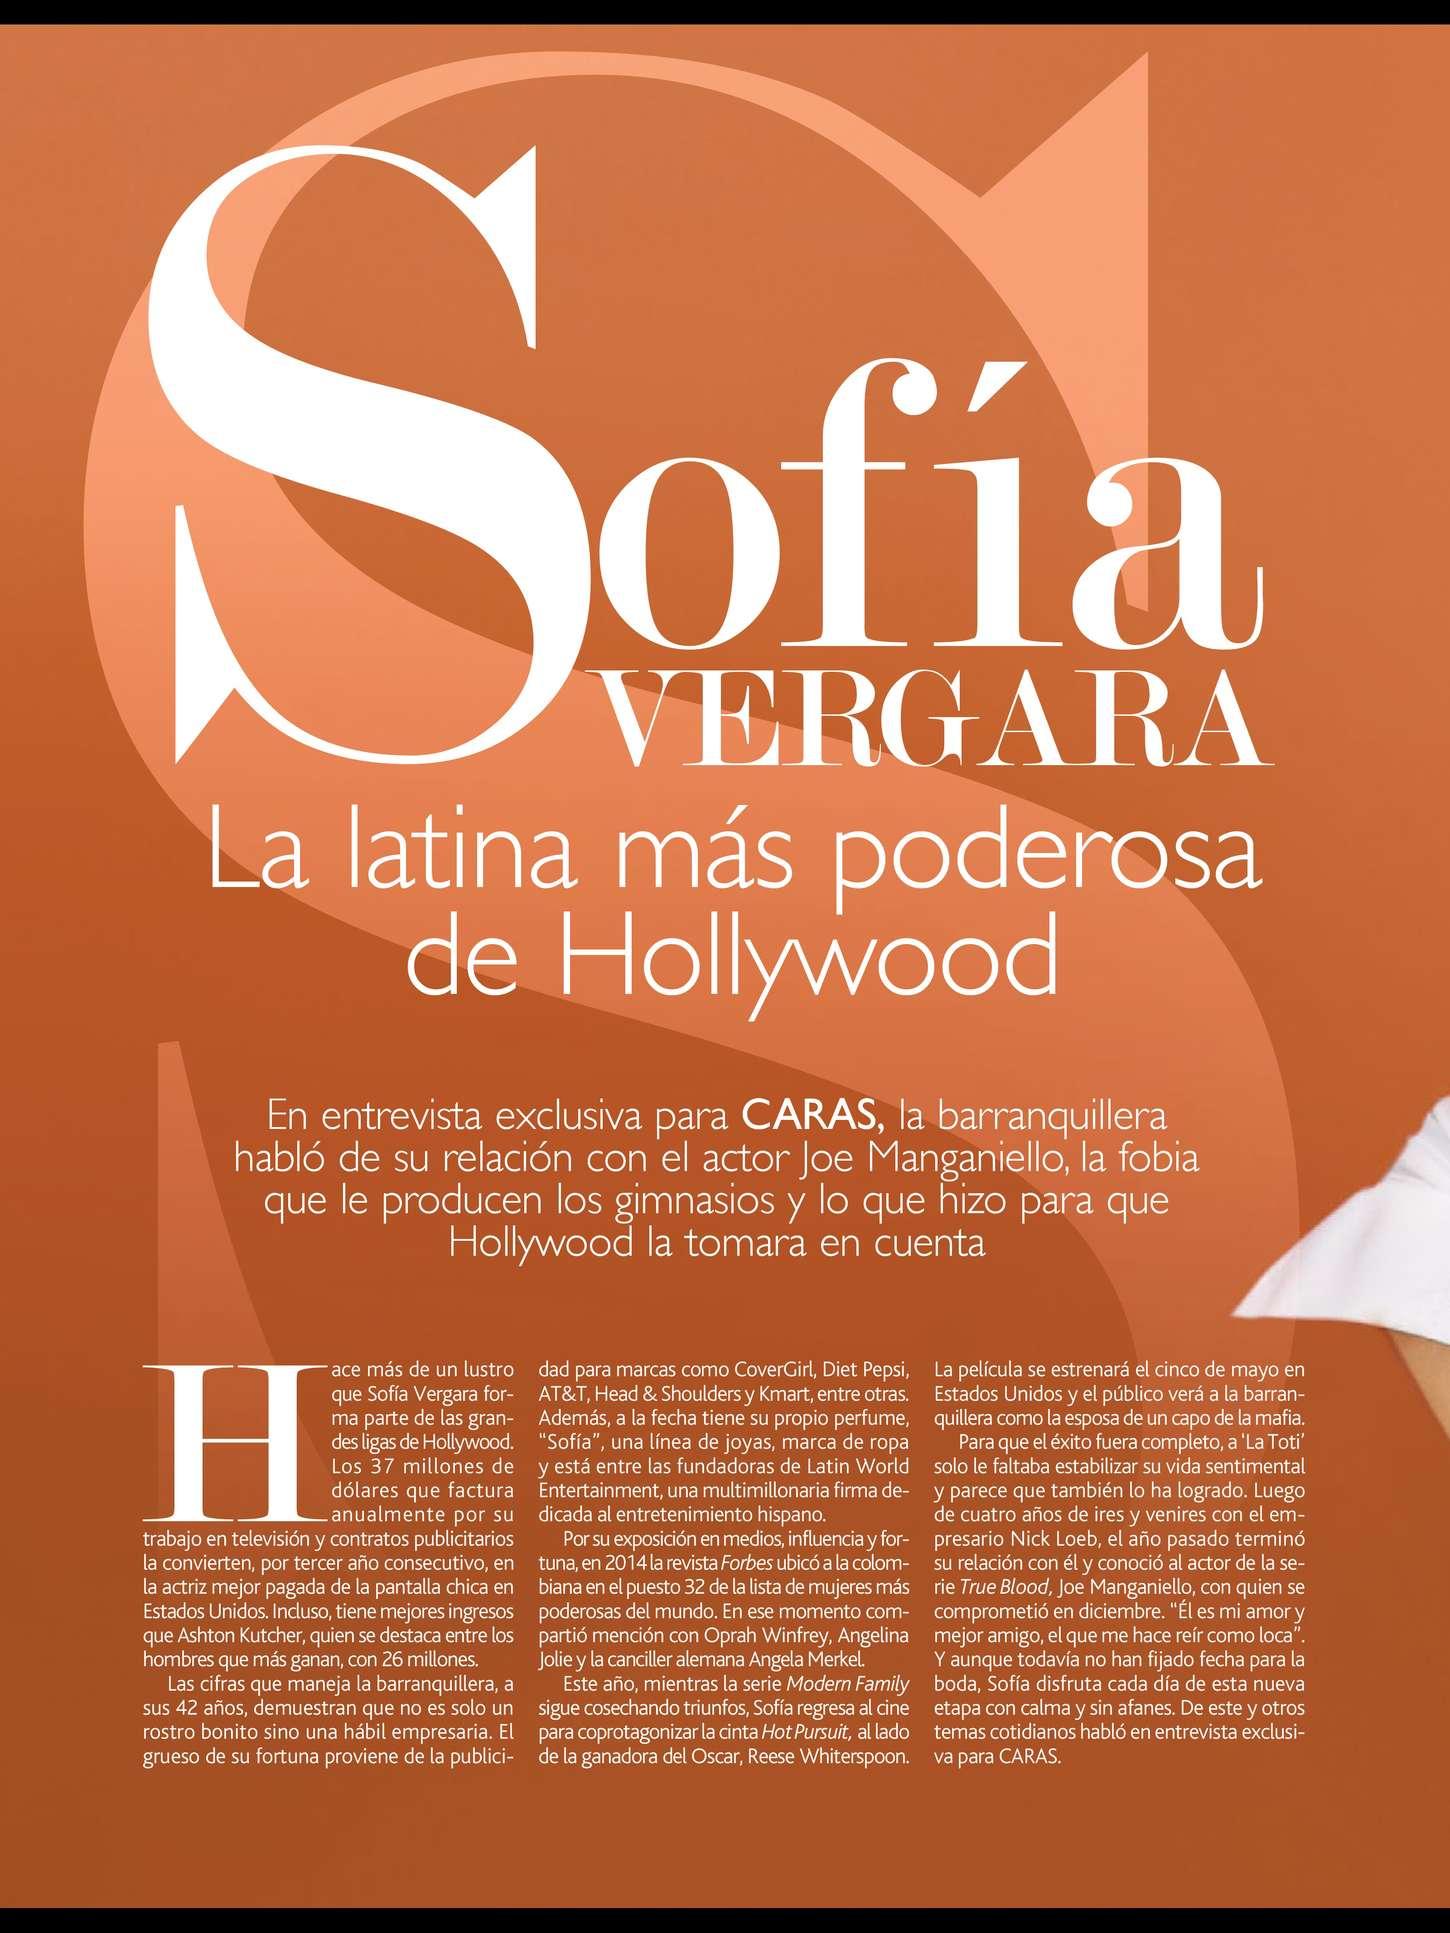 Uncategorized 2015 : Sofía Vergara: Caras Magazine 2015 -01